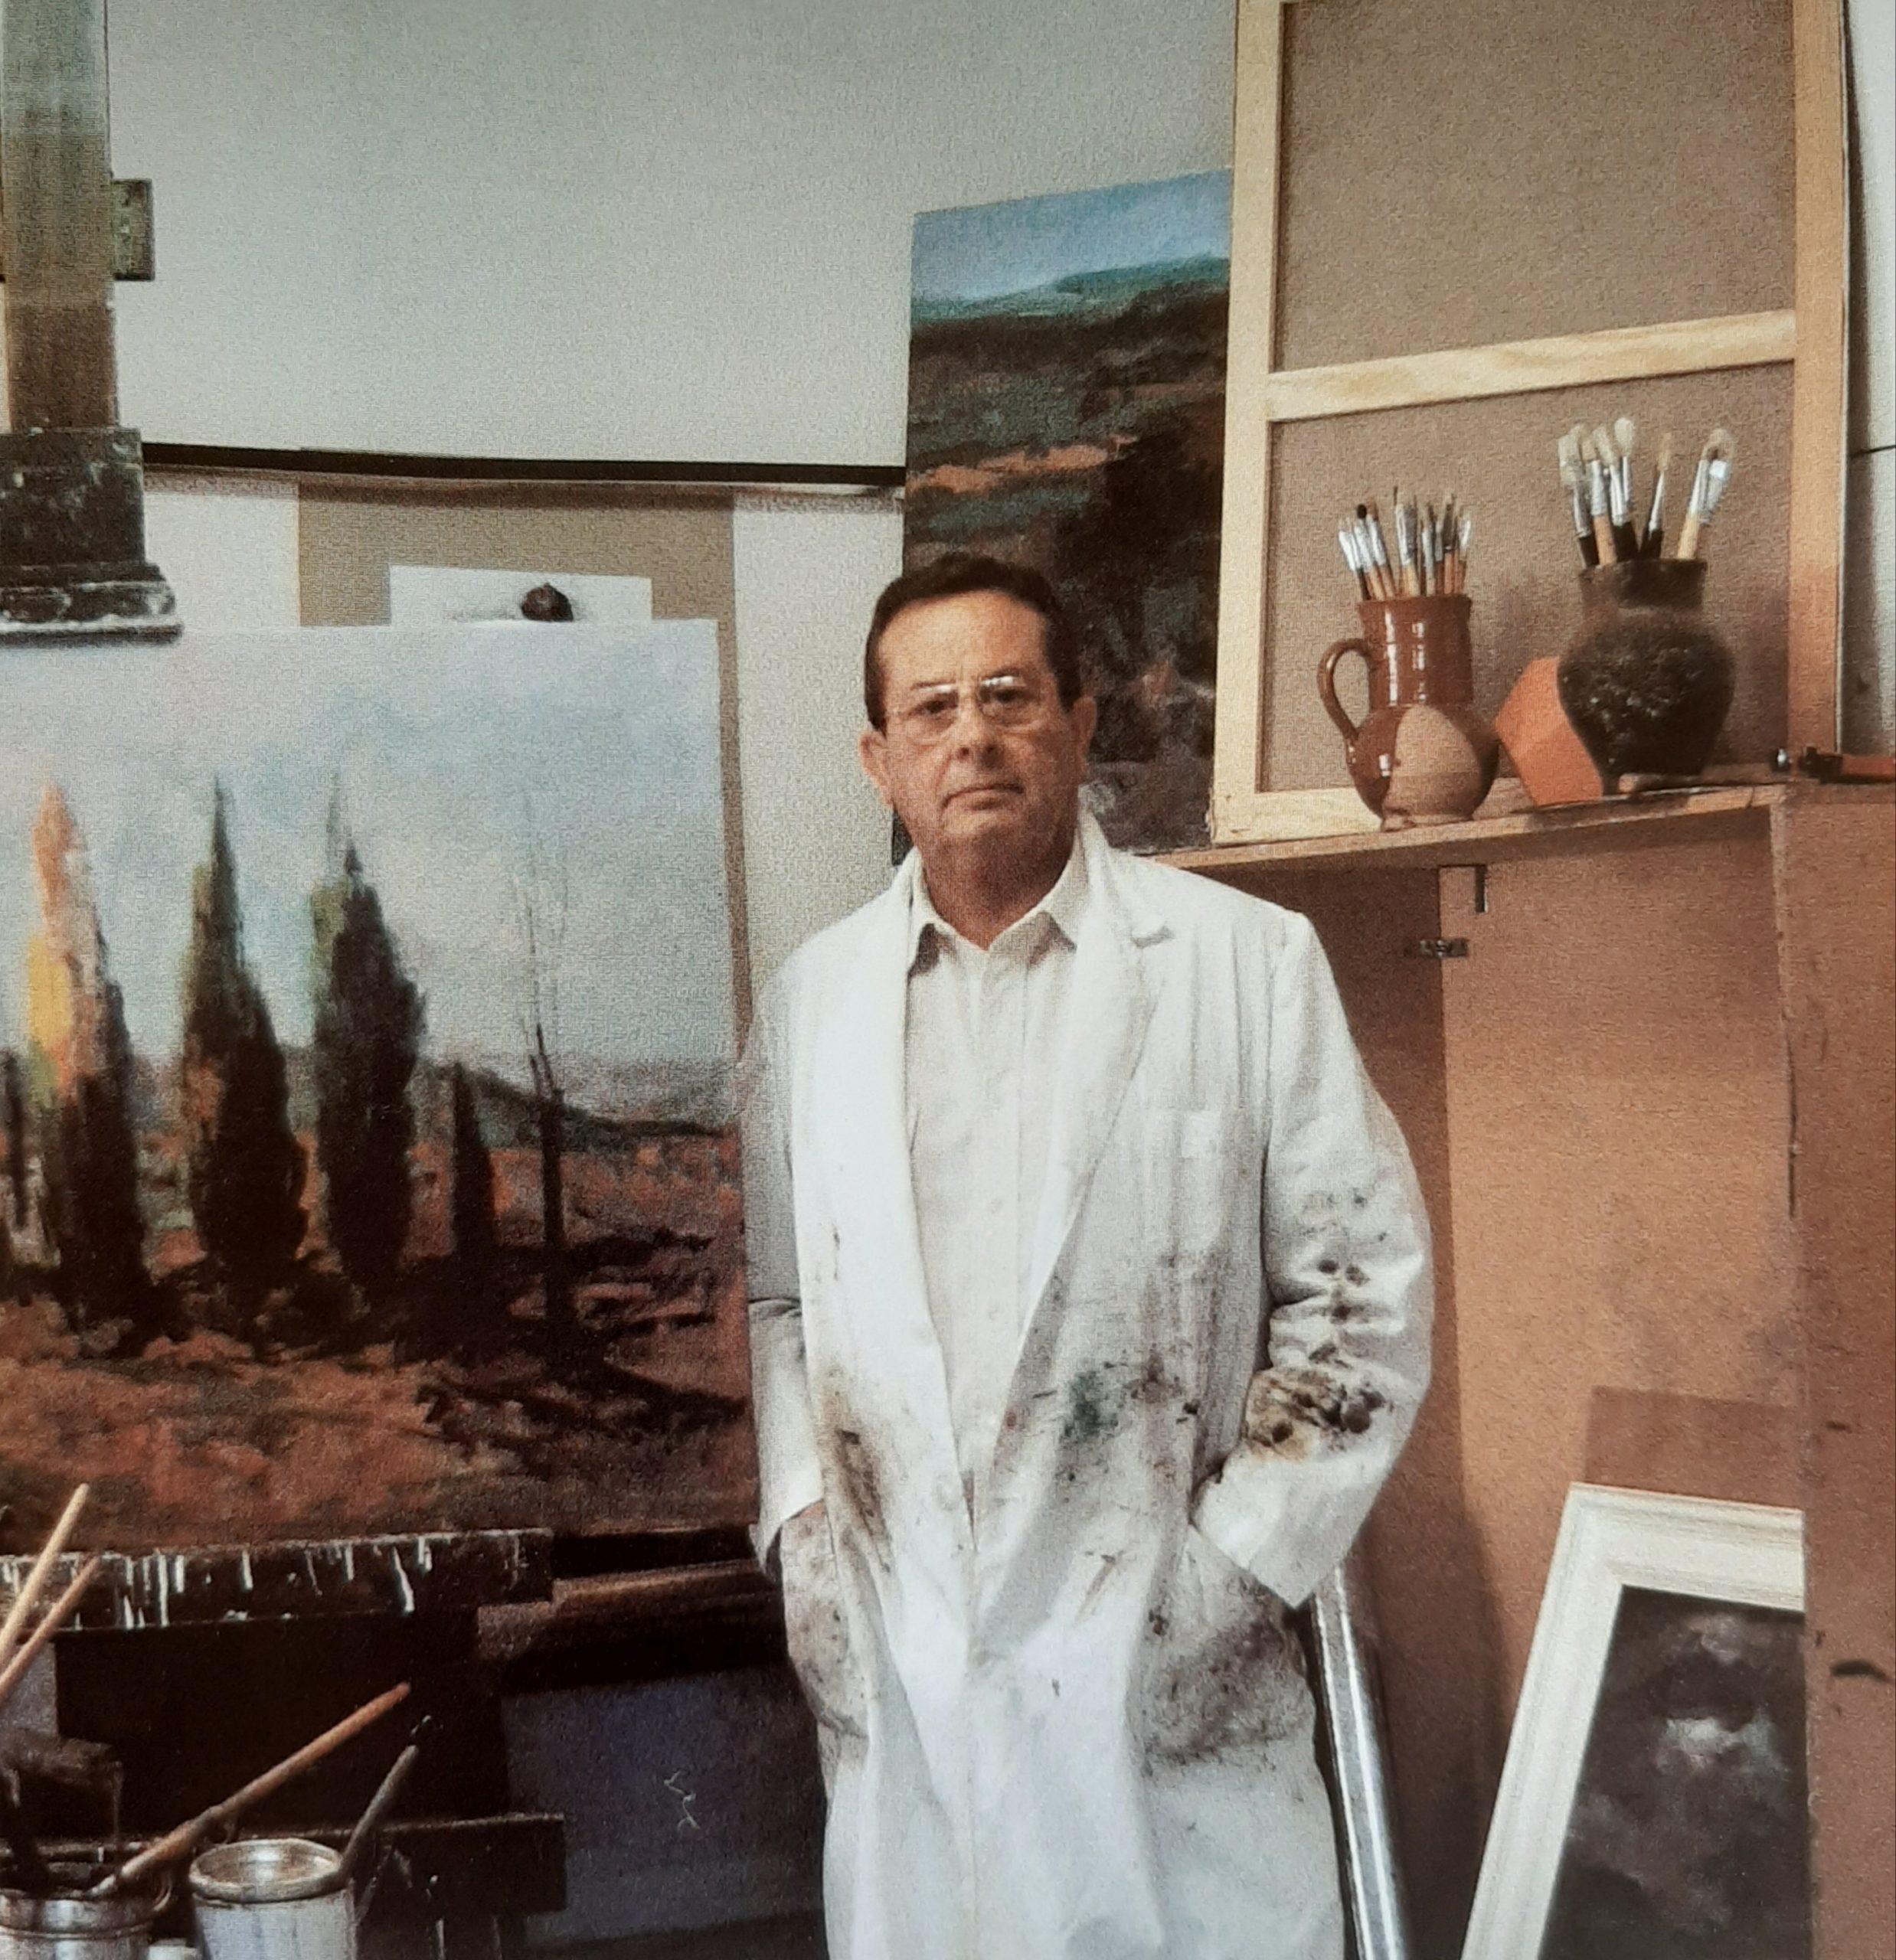 Juan Amo Vázquez